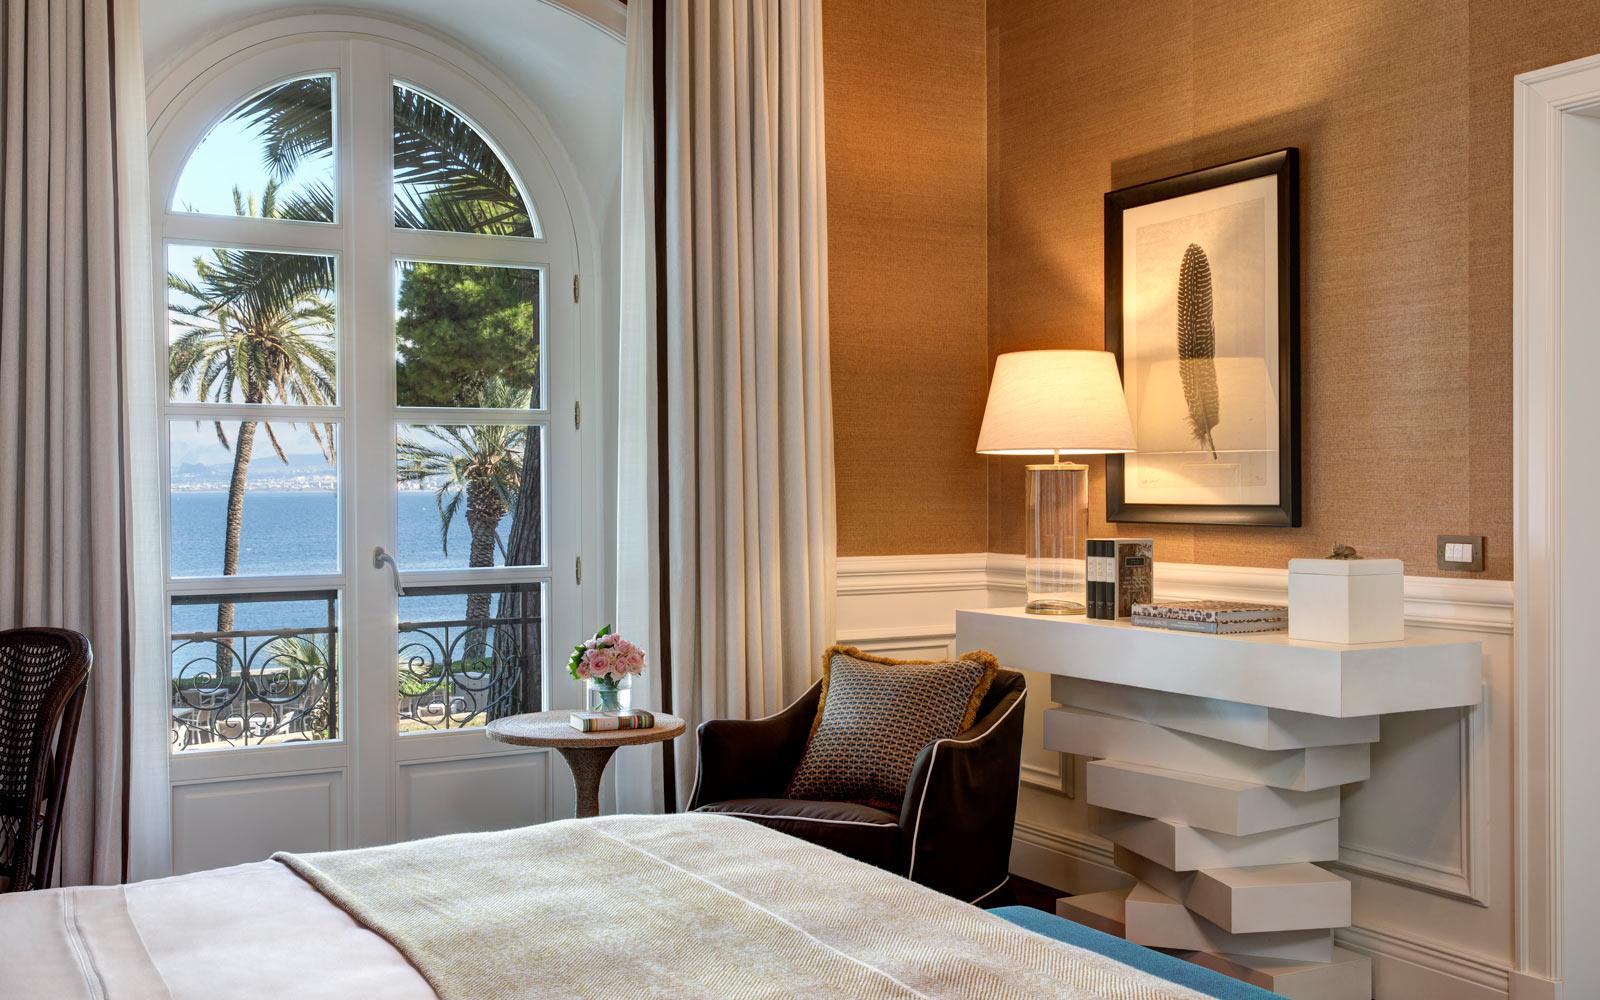 Villa Igiea Suite